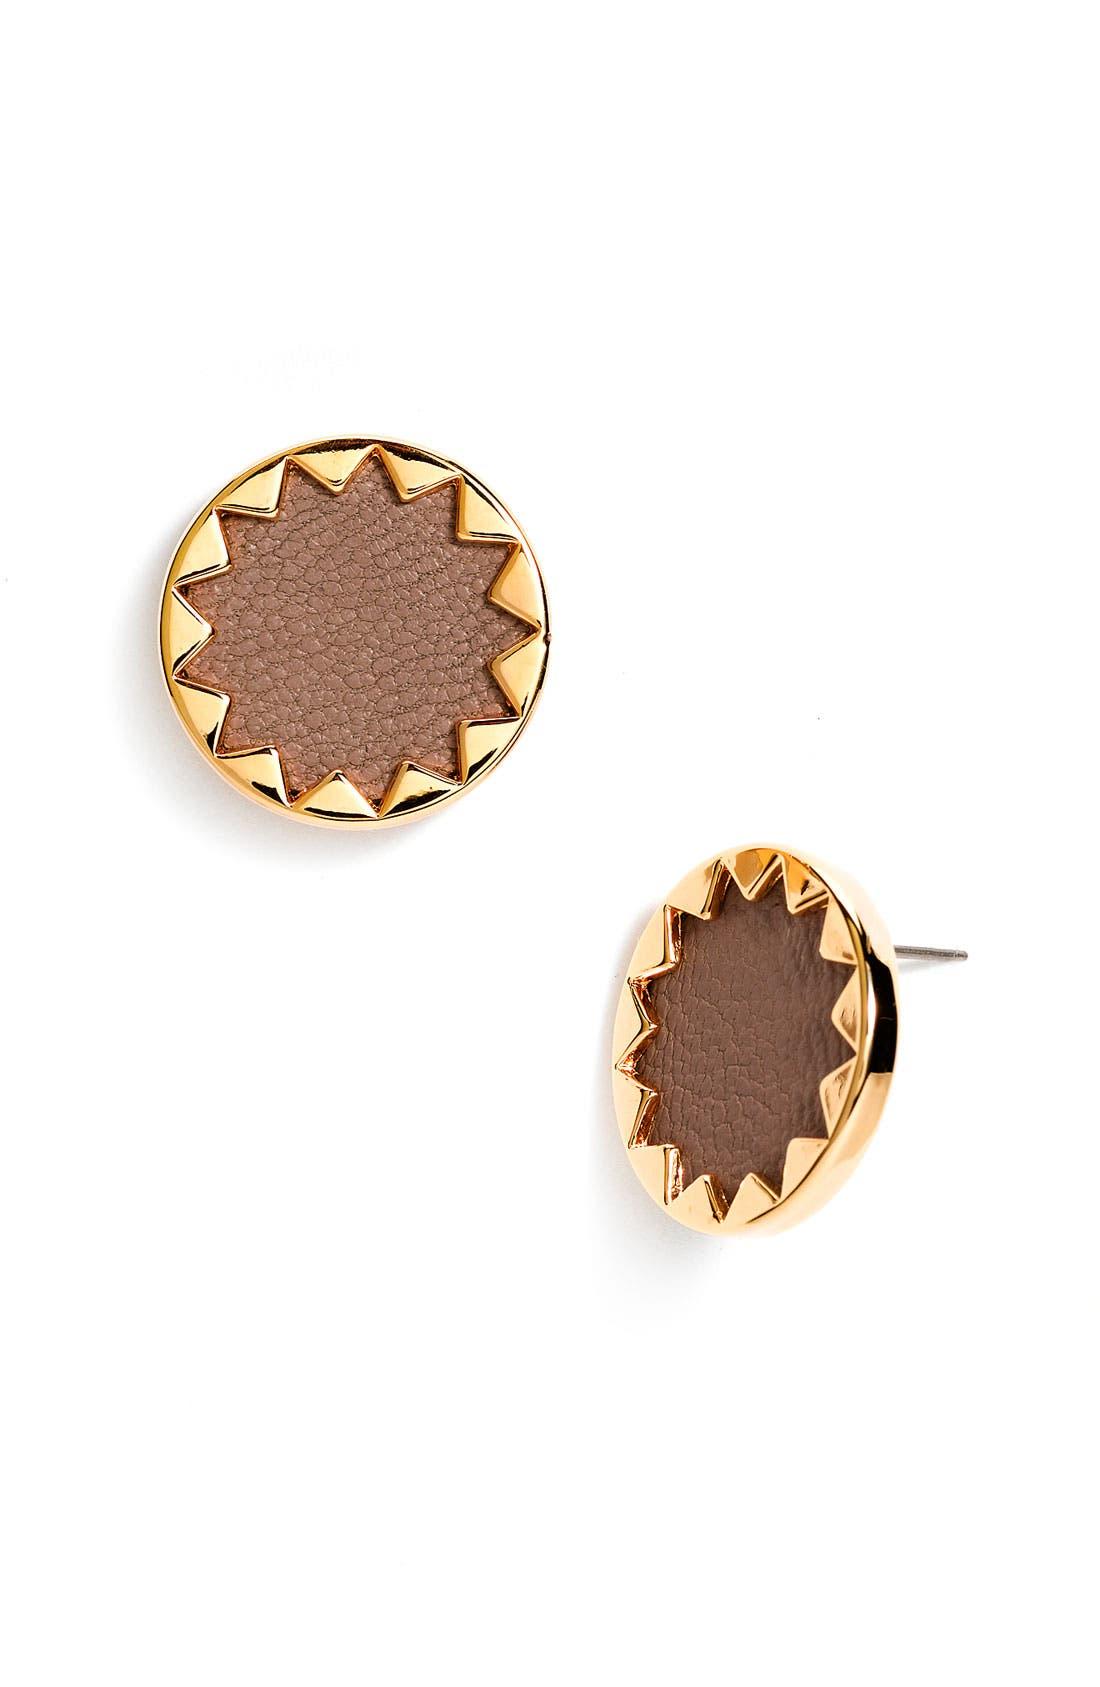 Main Image - House of Harlow 1960 Sunburst Button Earrings